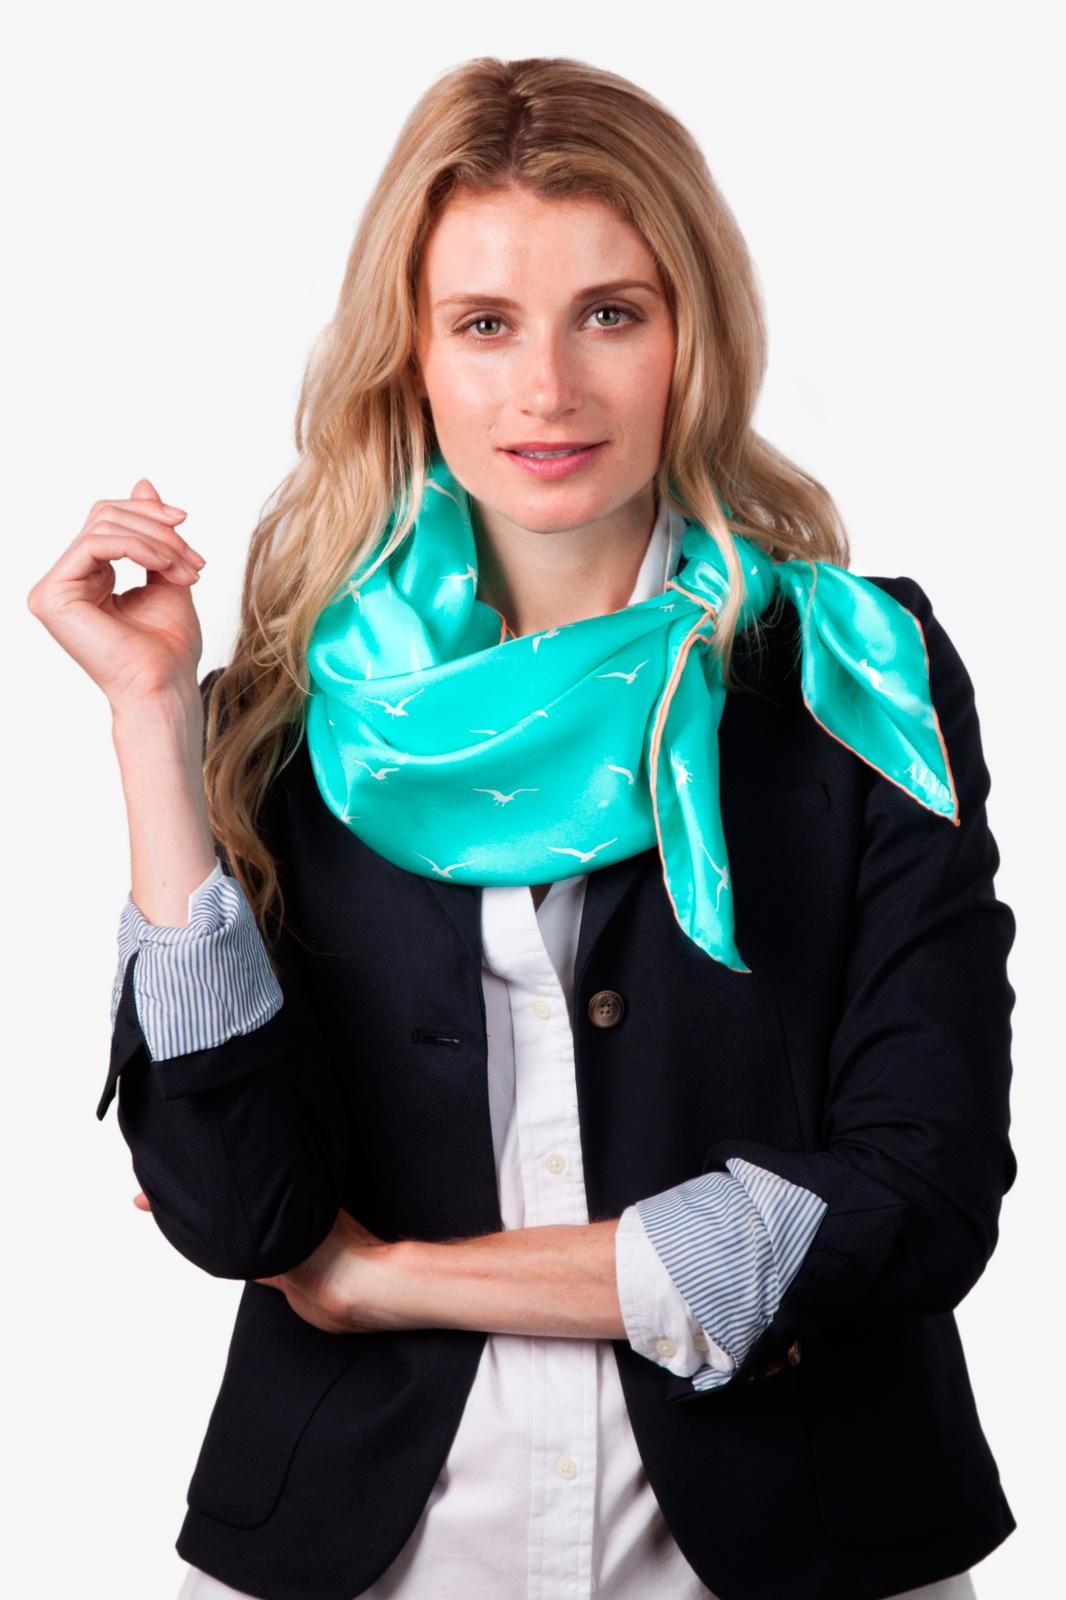 aqua-silk-seagull-silhouettes-square-scarf-238109-95-1600-0.jpg